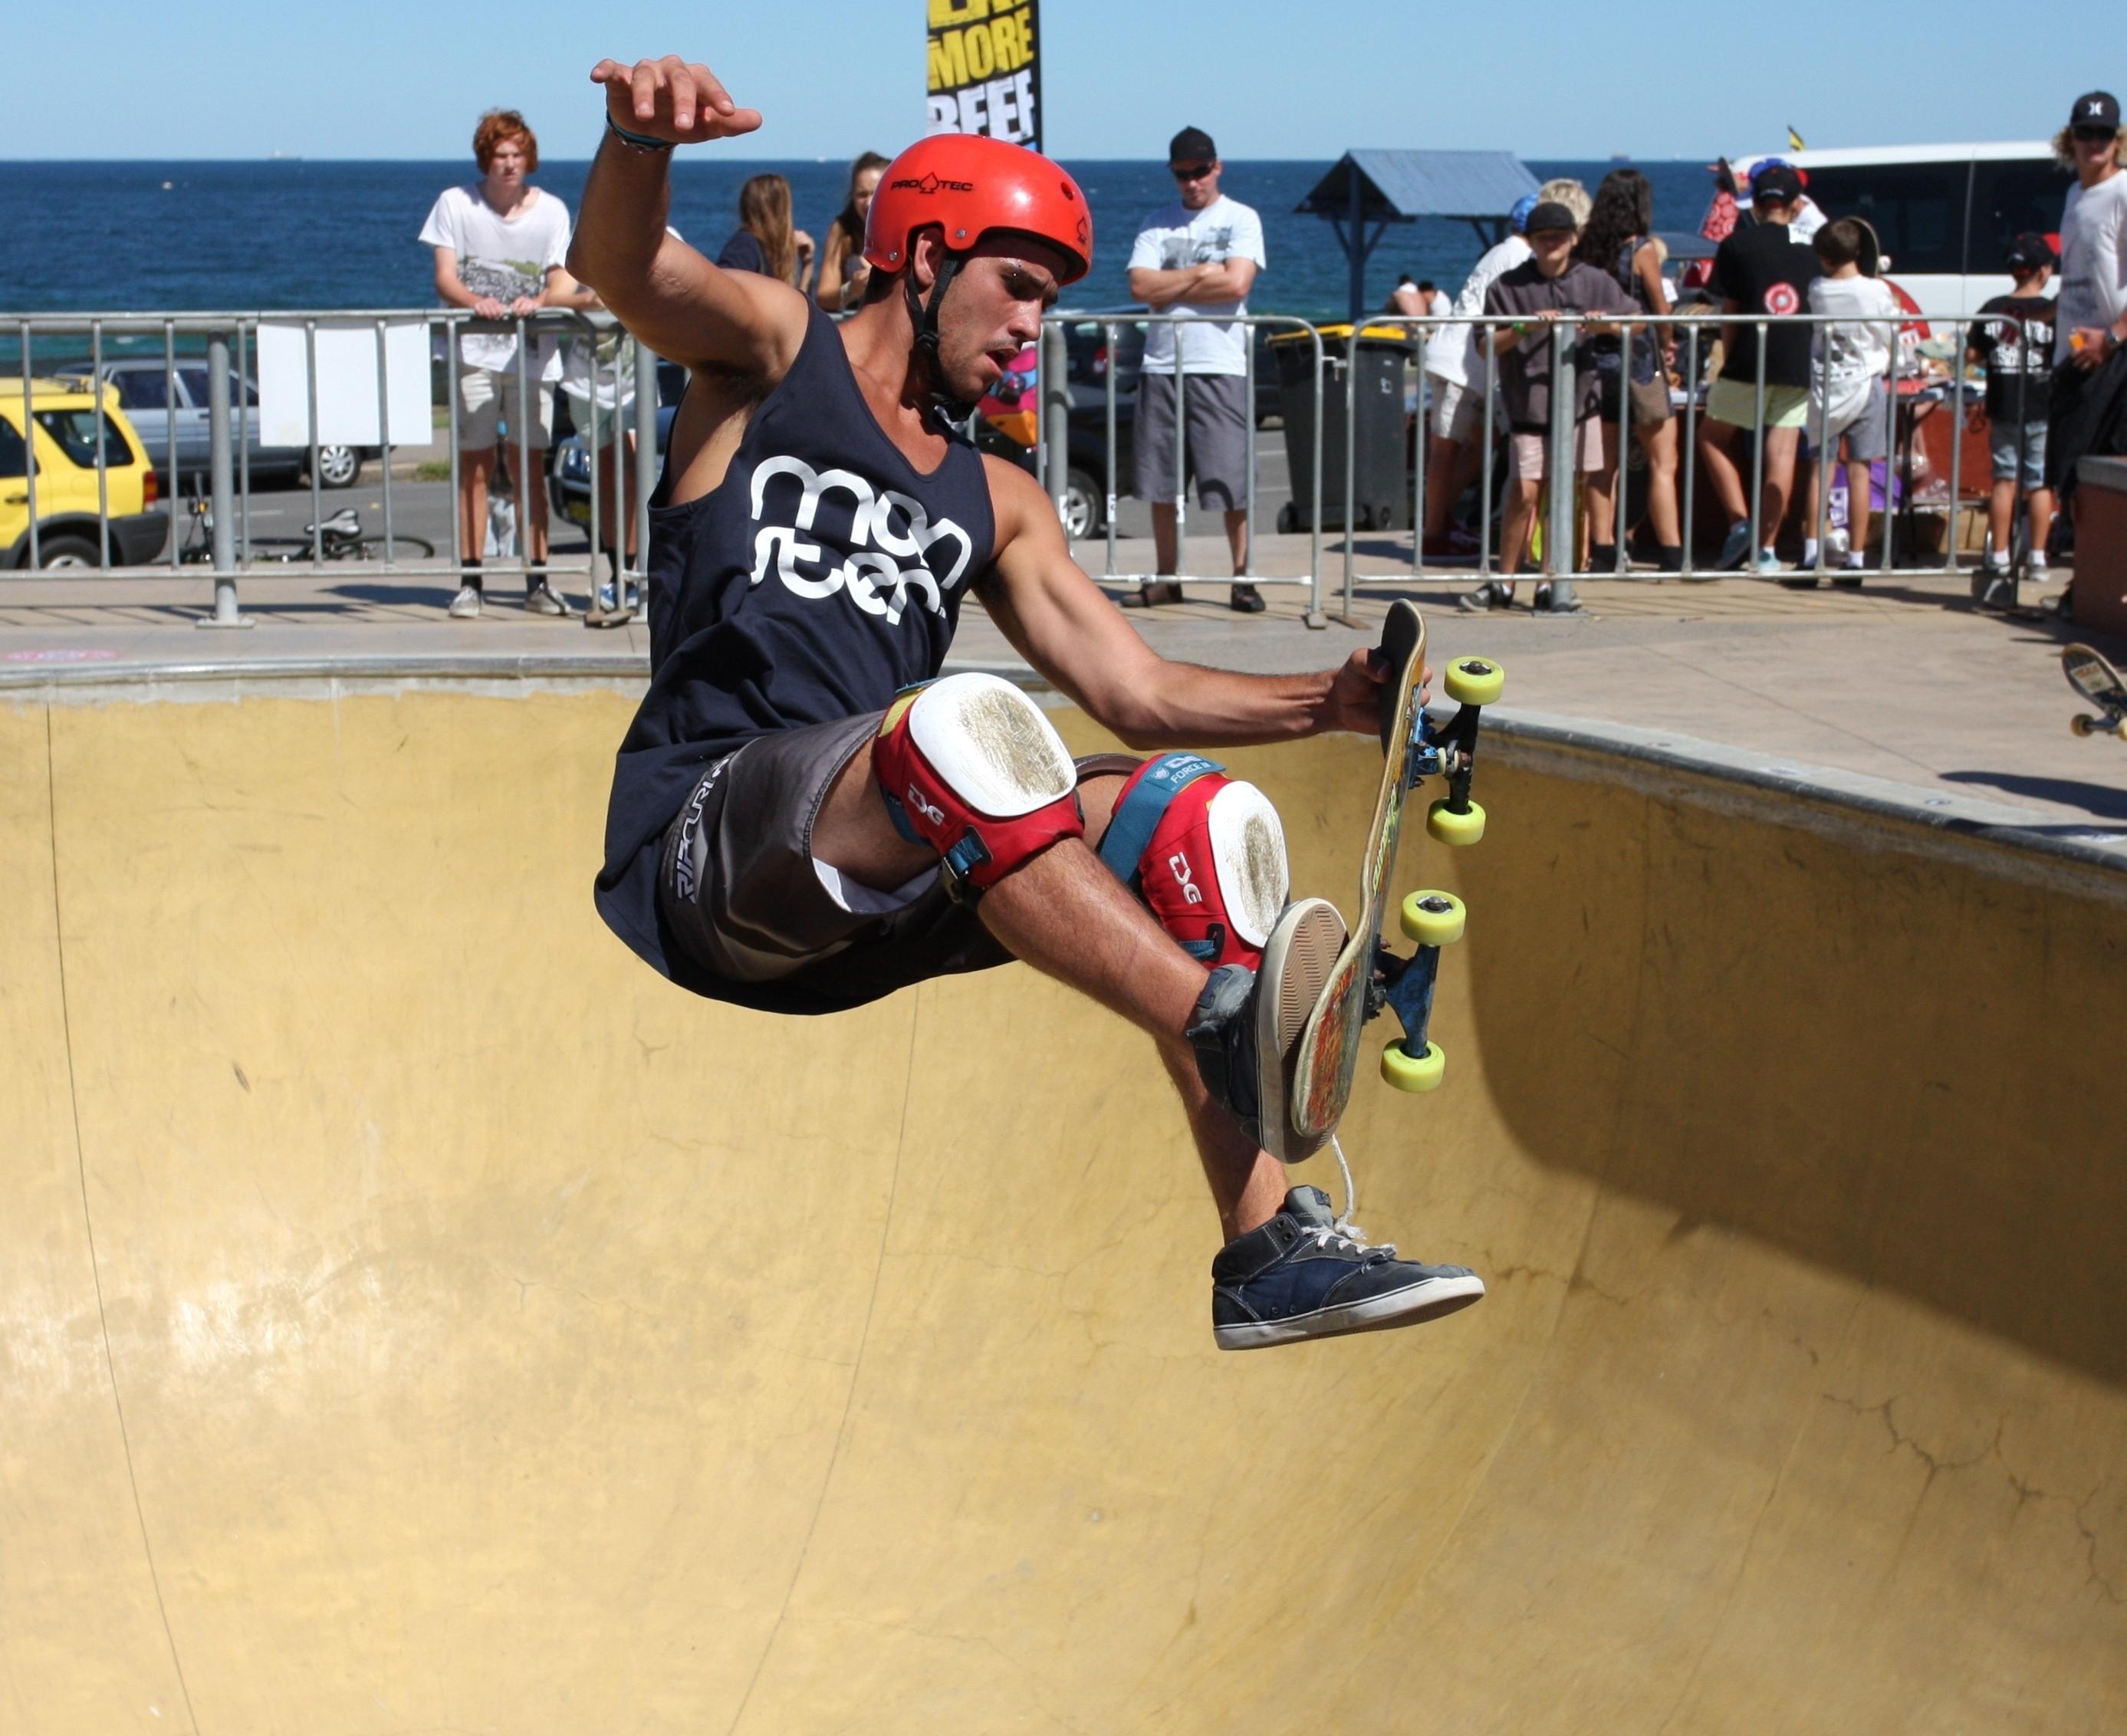 Skateboard_0001